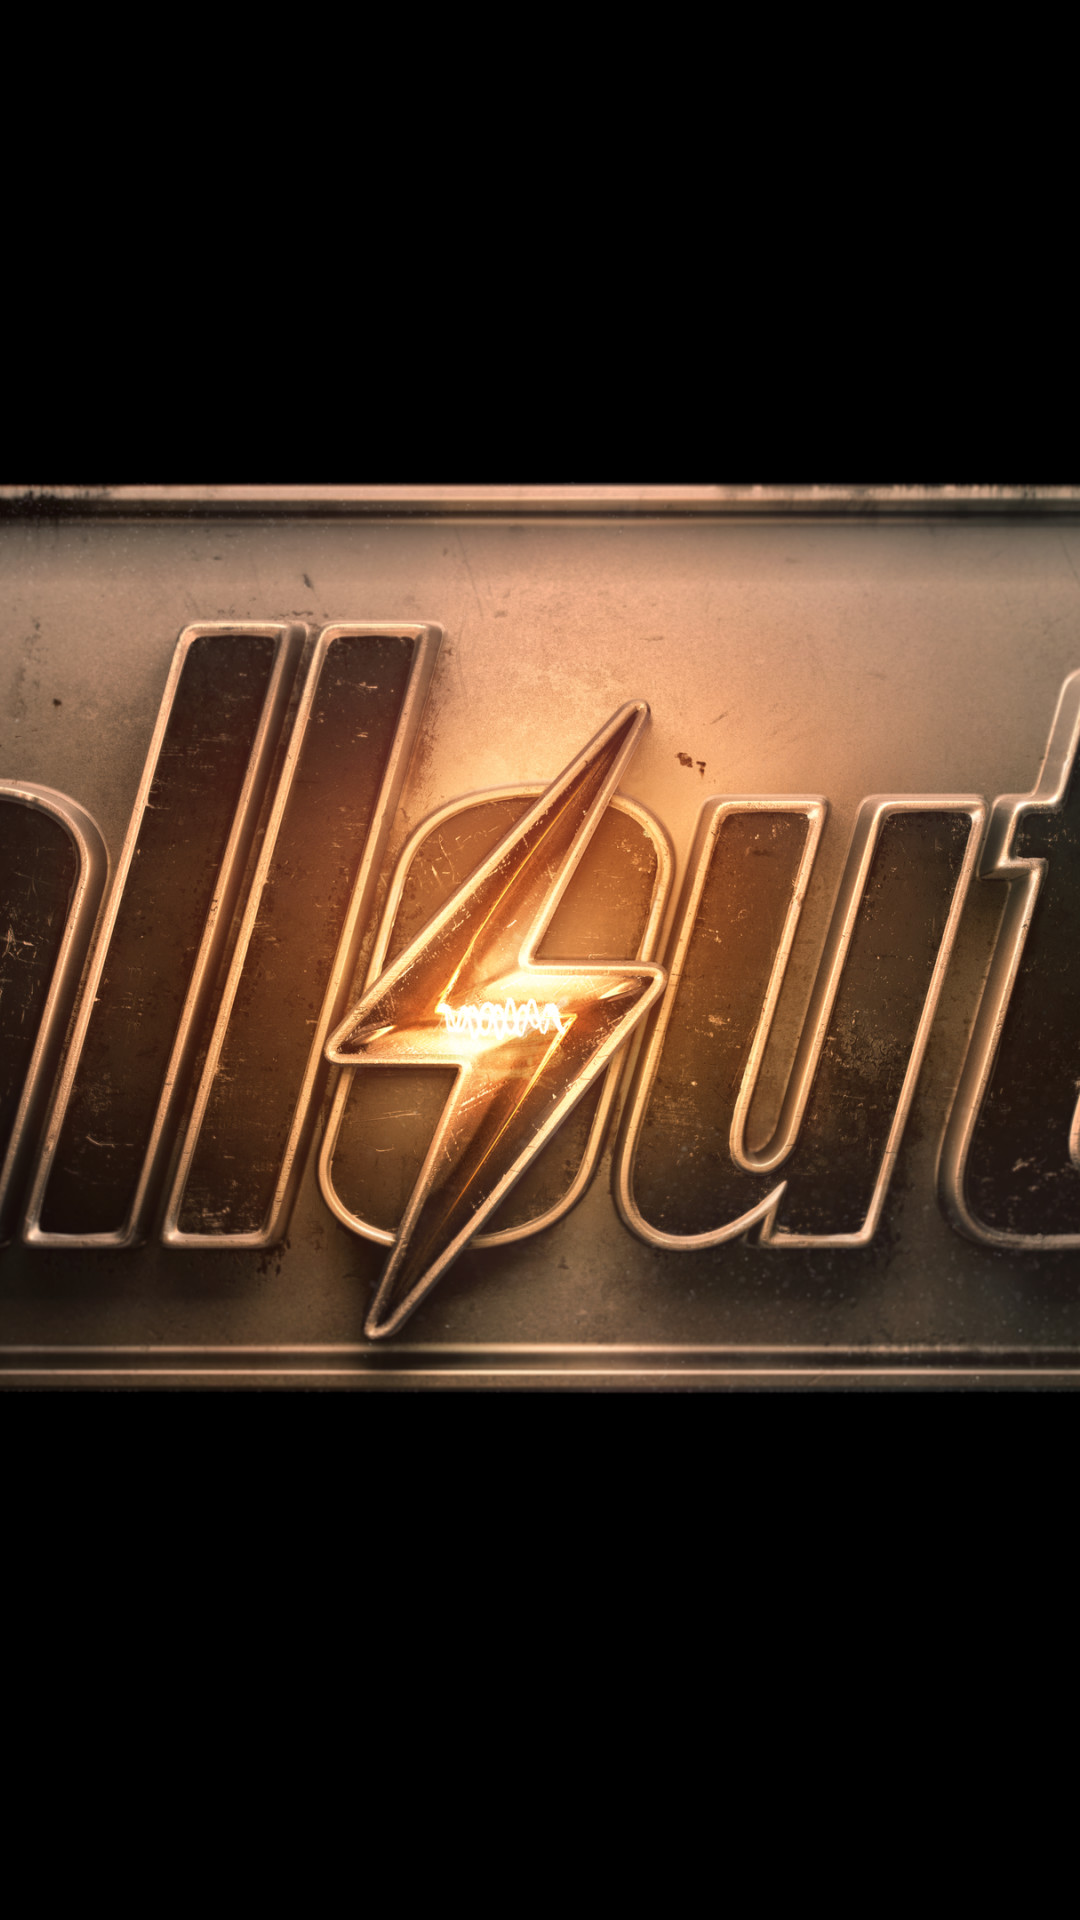 Beautiful Wallpaper Logo Fallout 4 - 312485  Pictures_94837.jpg